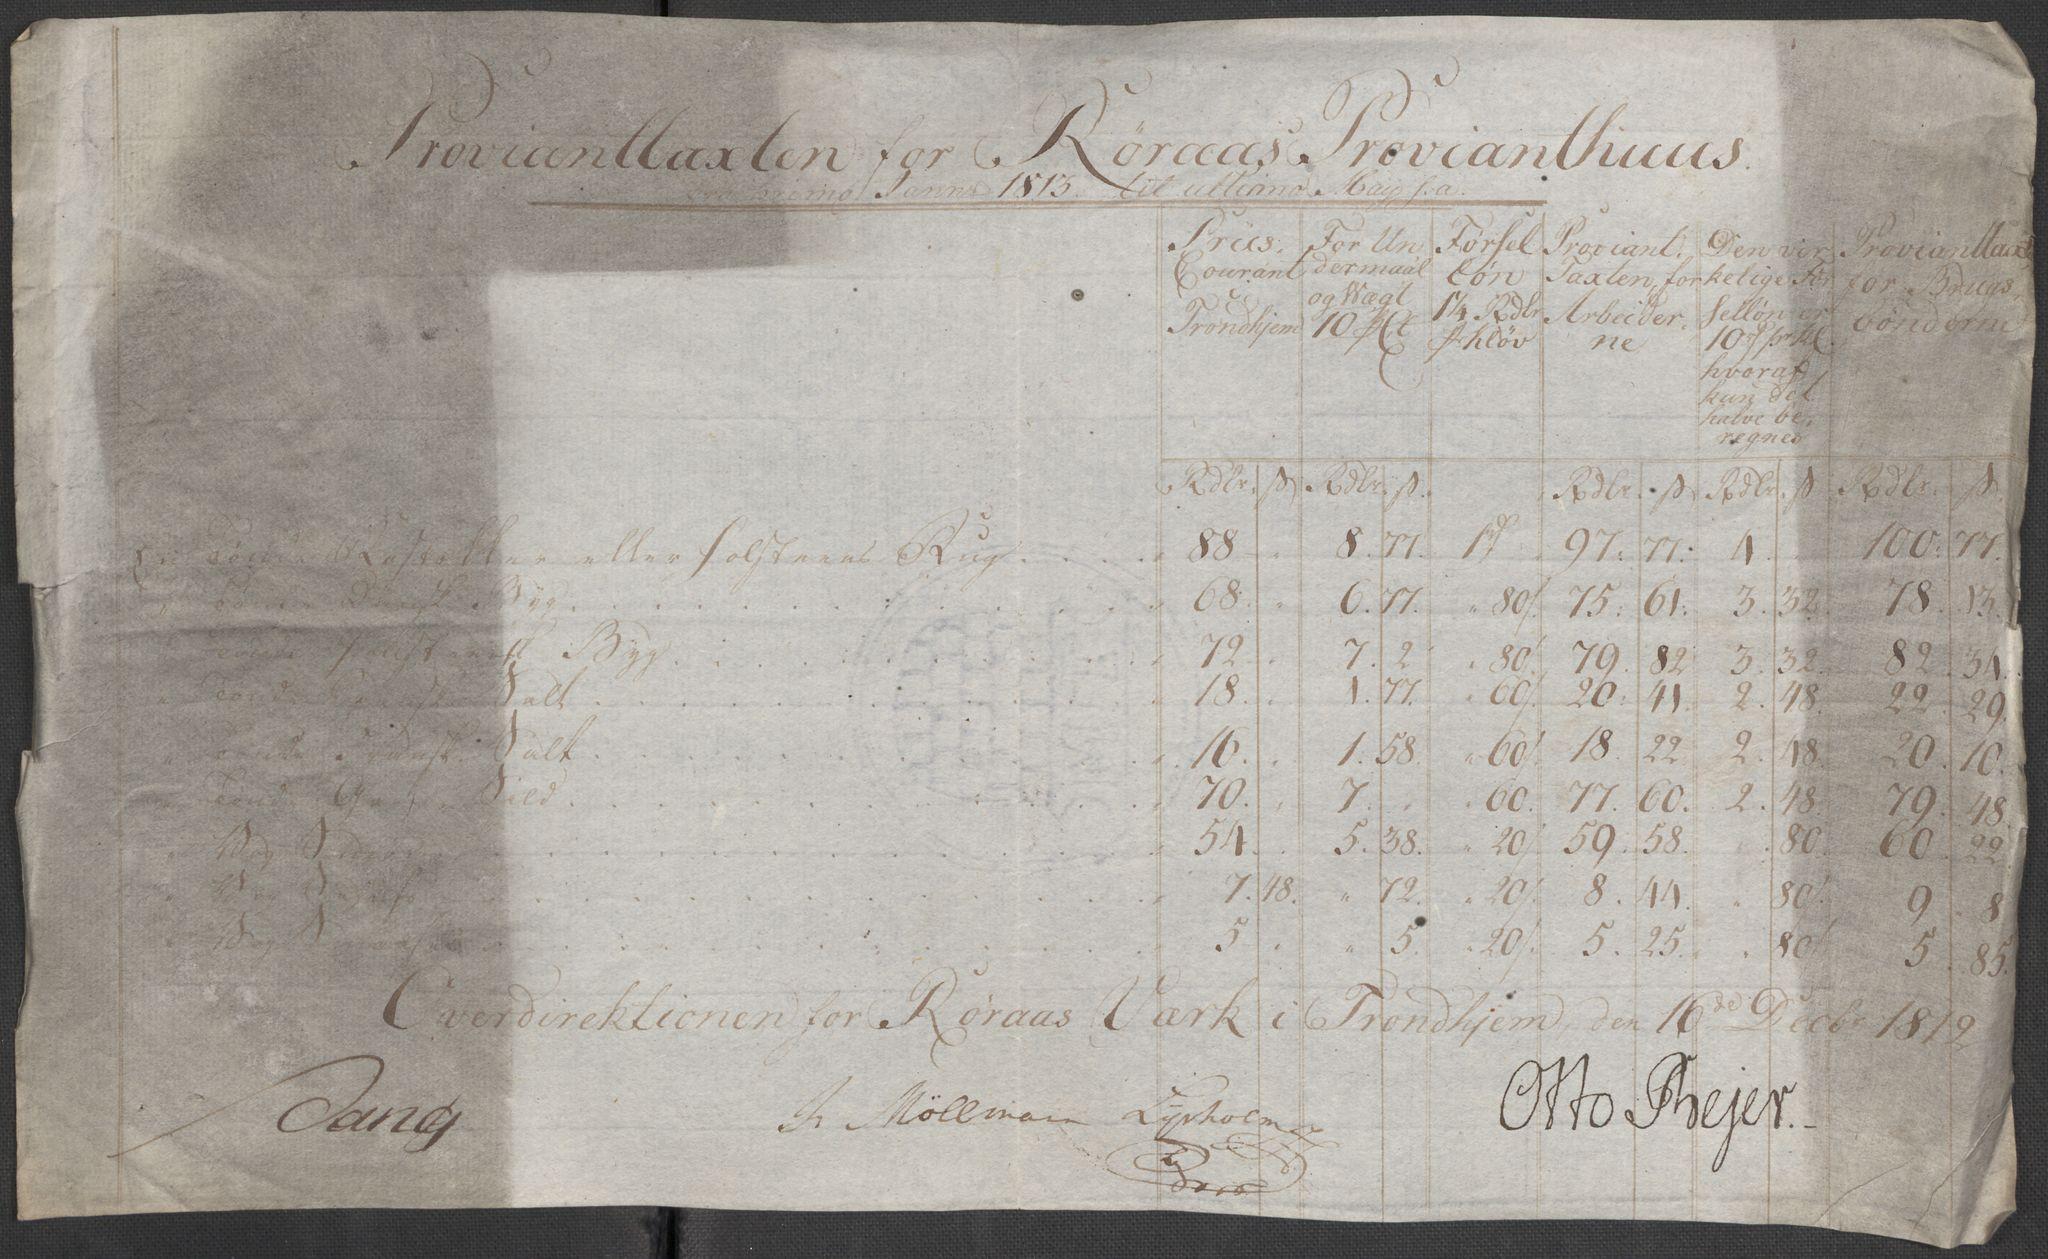 SAT, Røros kobberverk, 12/L0021: 12.20.9 Provianttakster, 1765-1824, s. 169